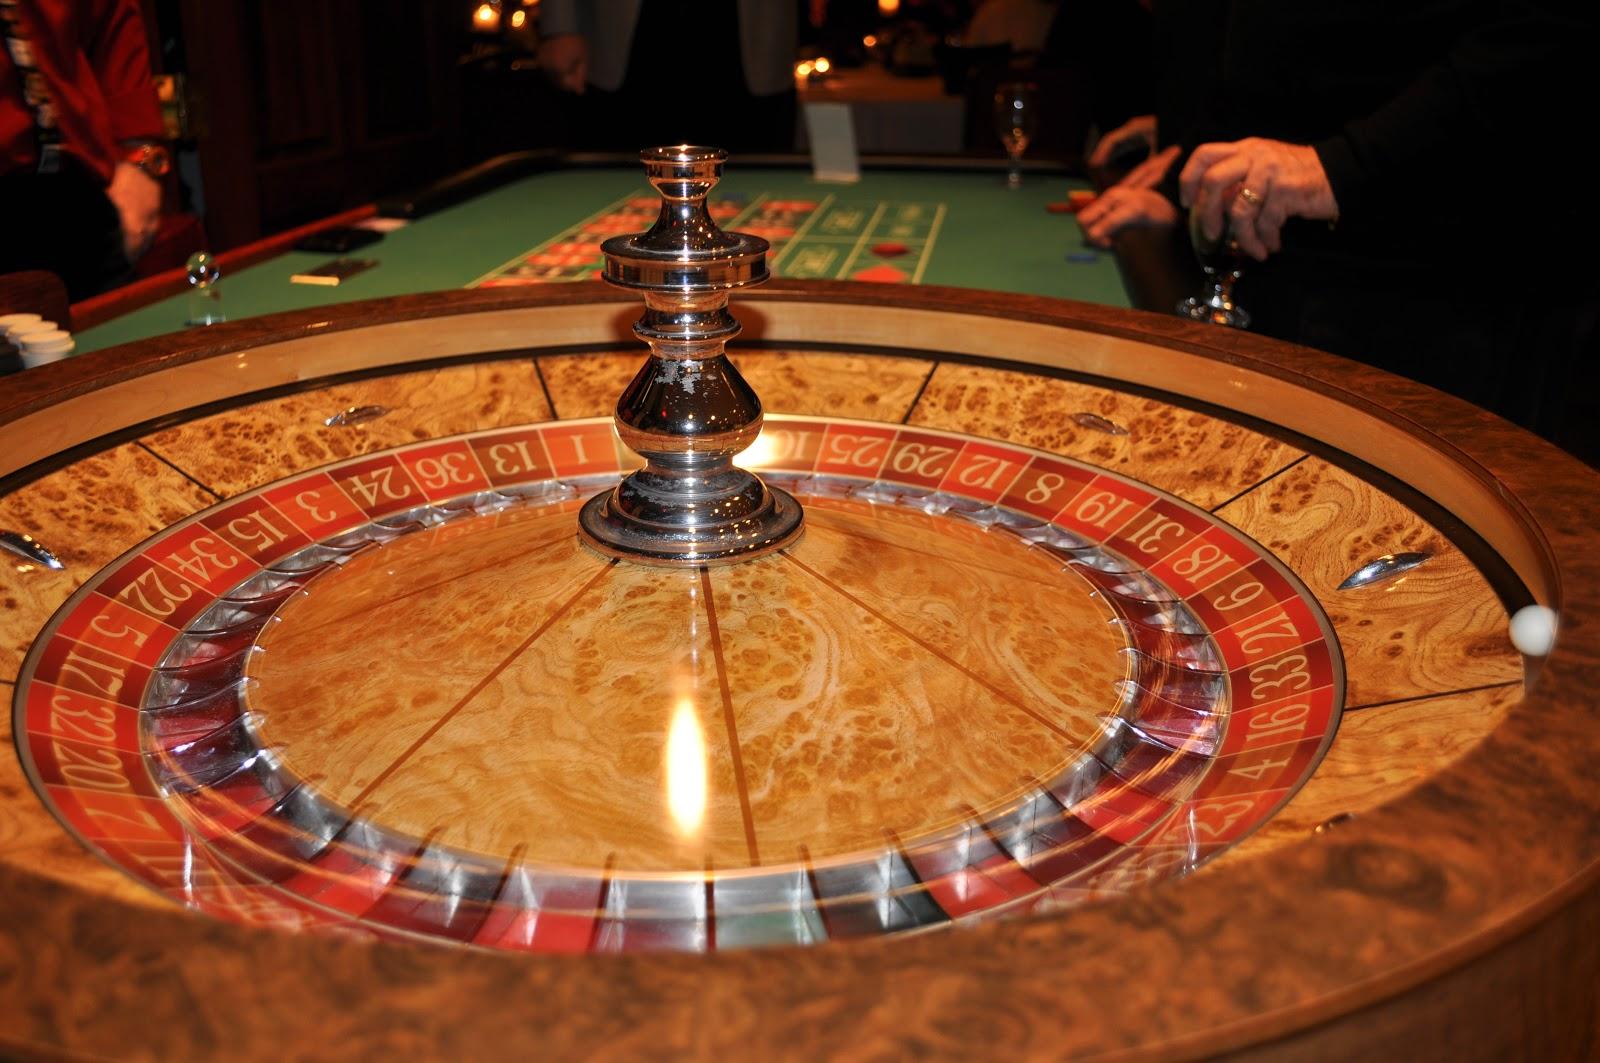 imagesjouer-au-casino-11.jpg